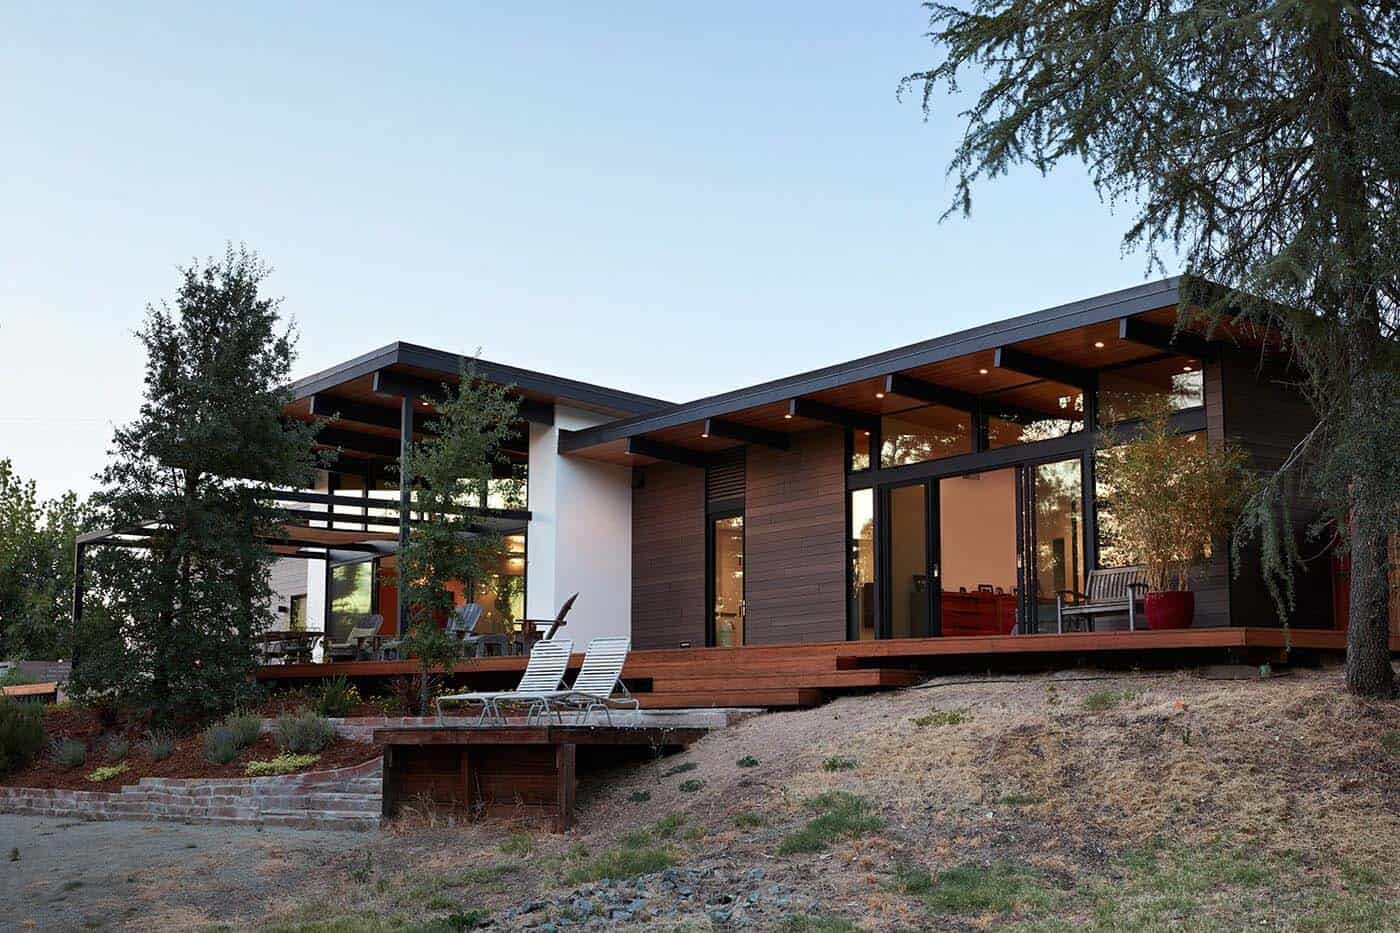 Sacramento Modern Residence-Klopf Architecture-17-1 Kindesign